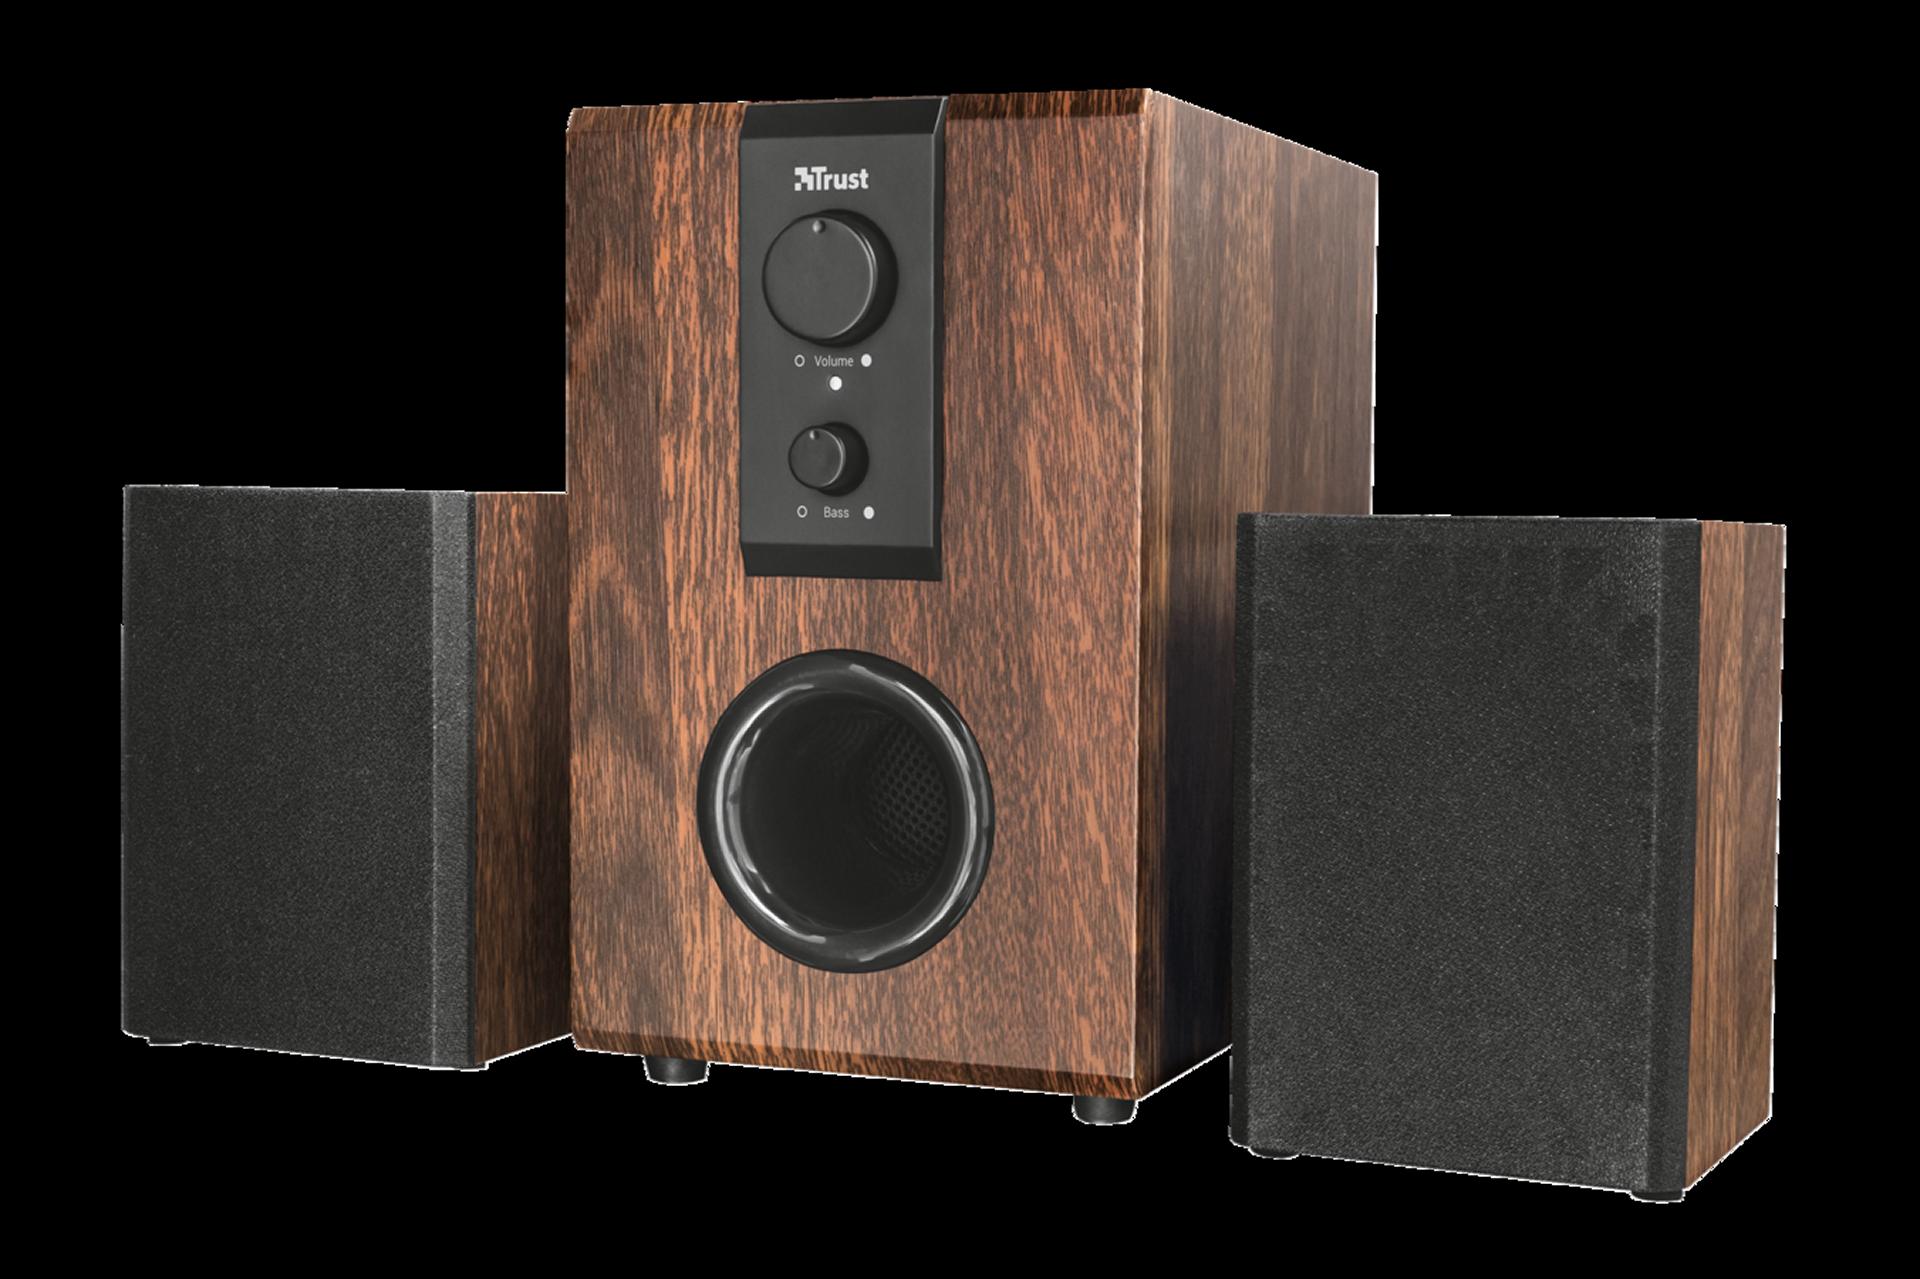 zvuk. systém TRUST Silva 2.1 Speaker Set for pc and laptop